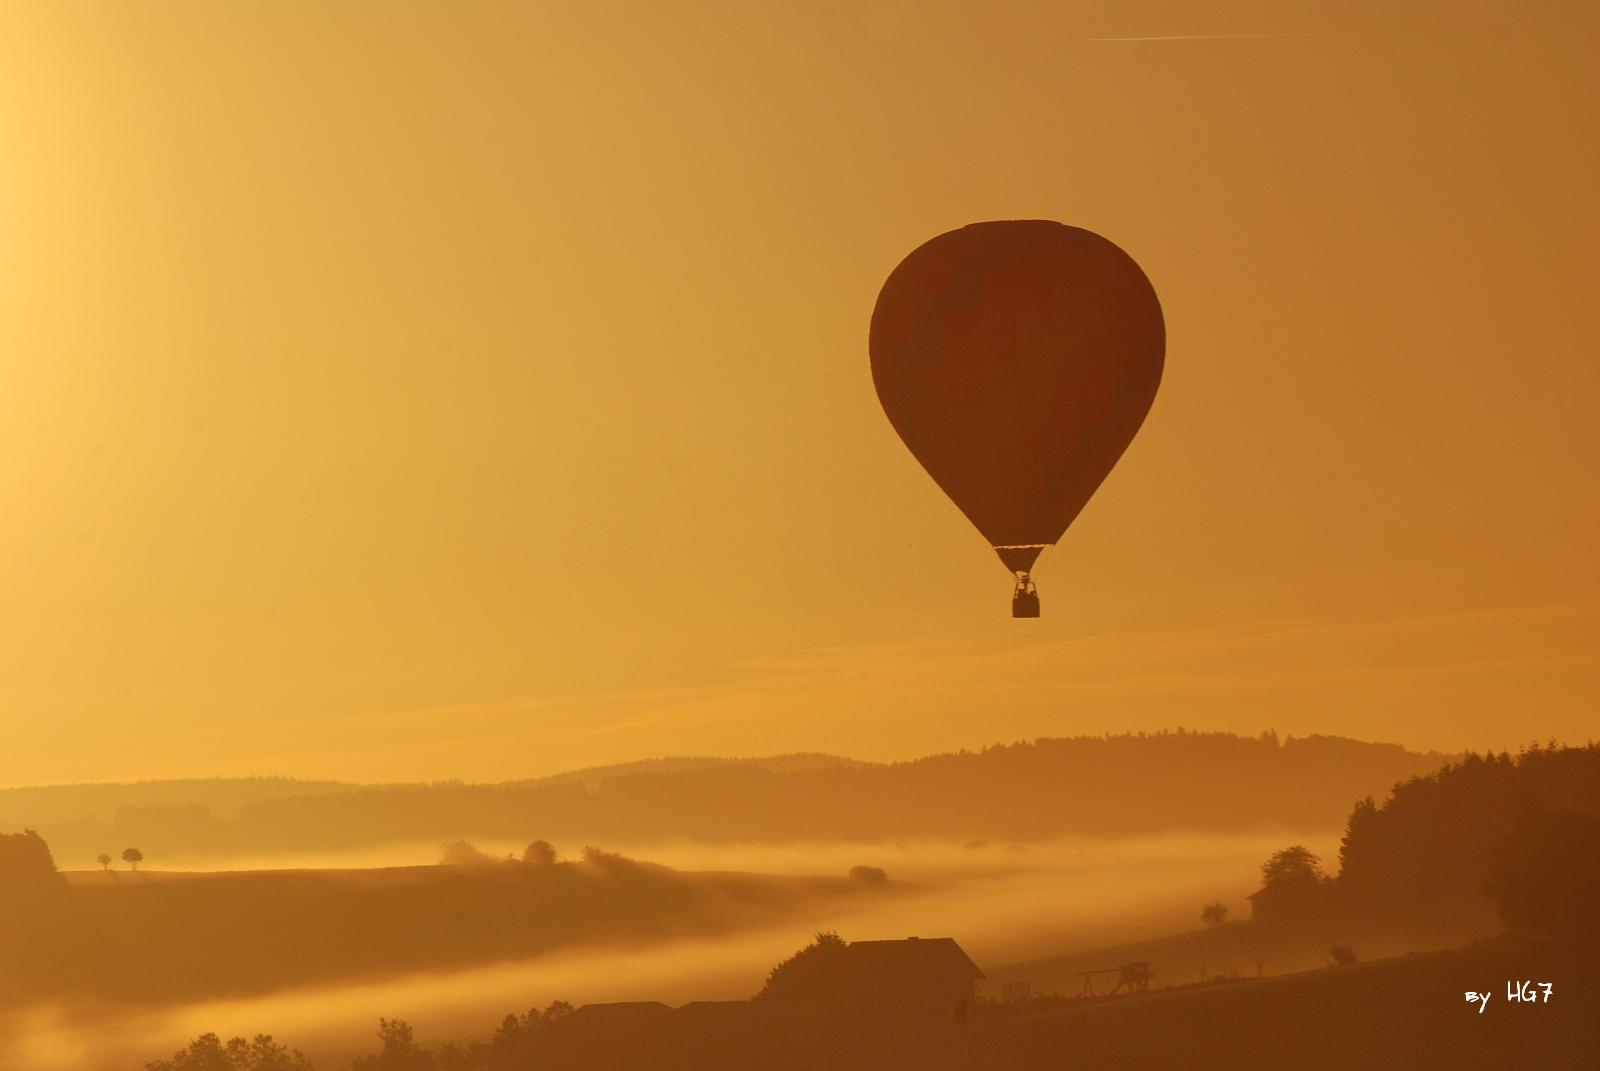 Sunrise in Wershofen